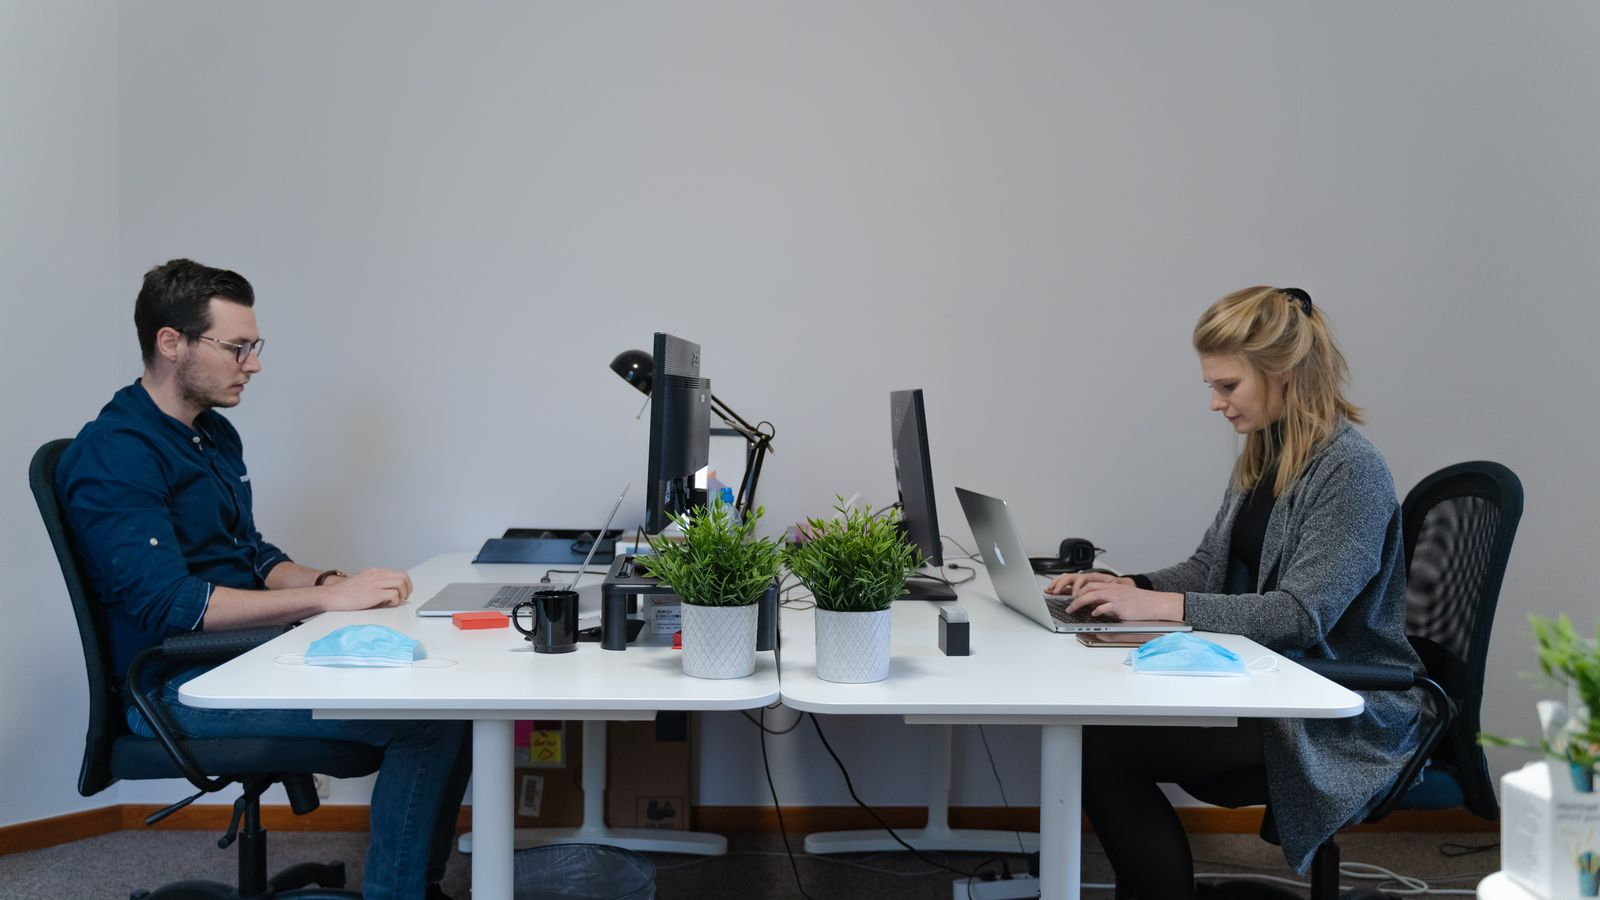 Social Distancing at desks